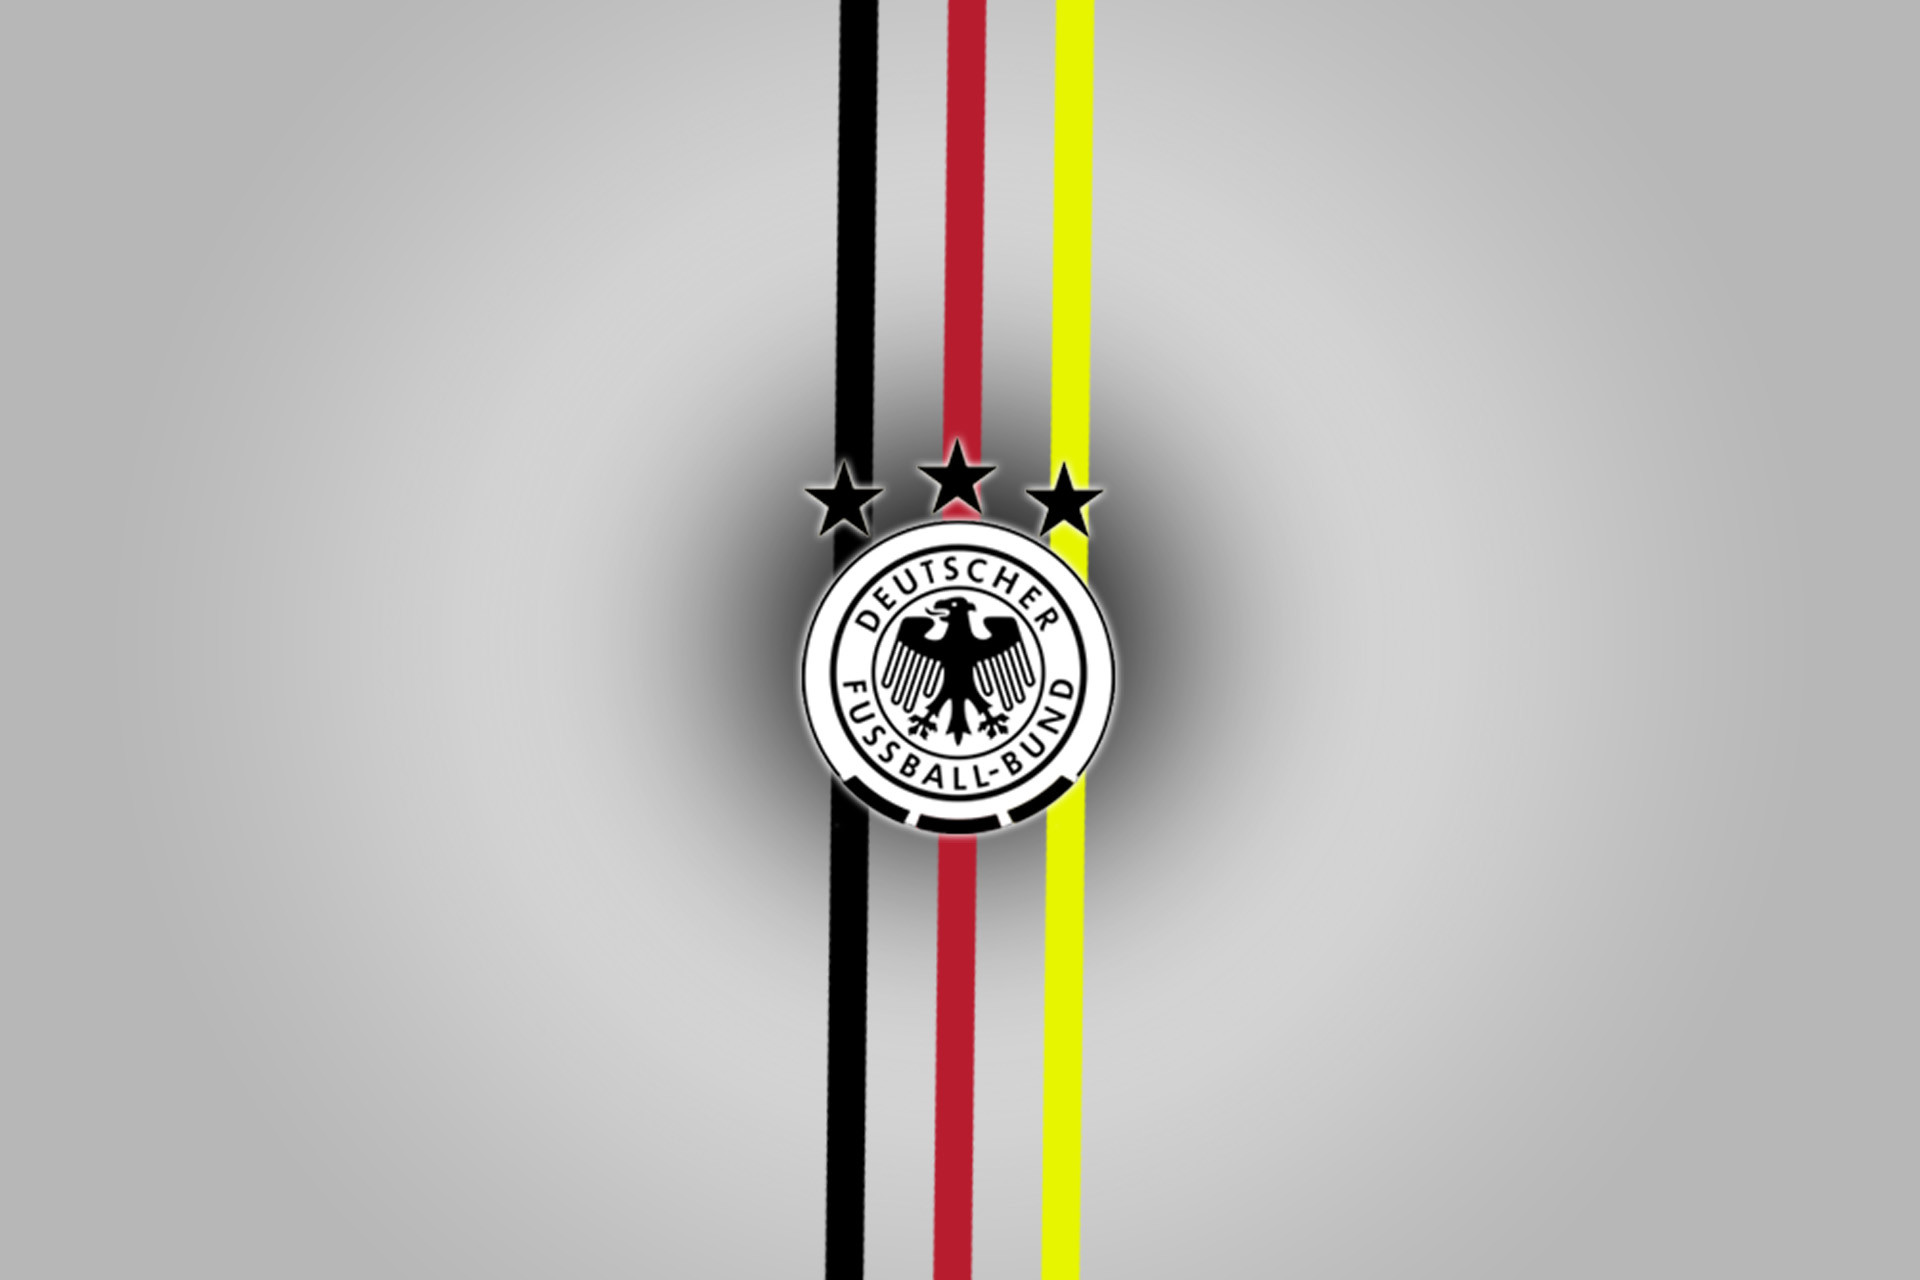 Deutscher Fußball-Bund Logo Superimposed on the German Flag 720 | Football team  logos and Football team